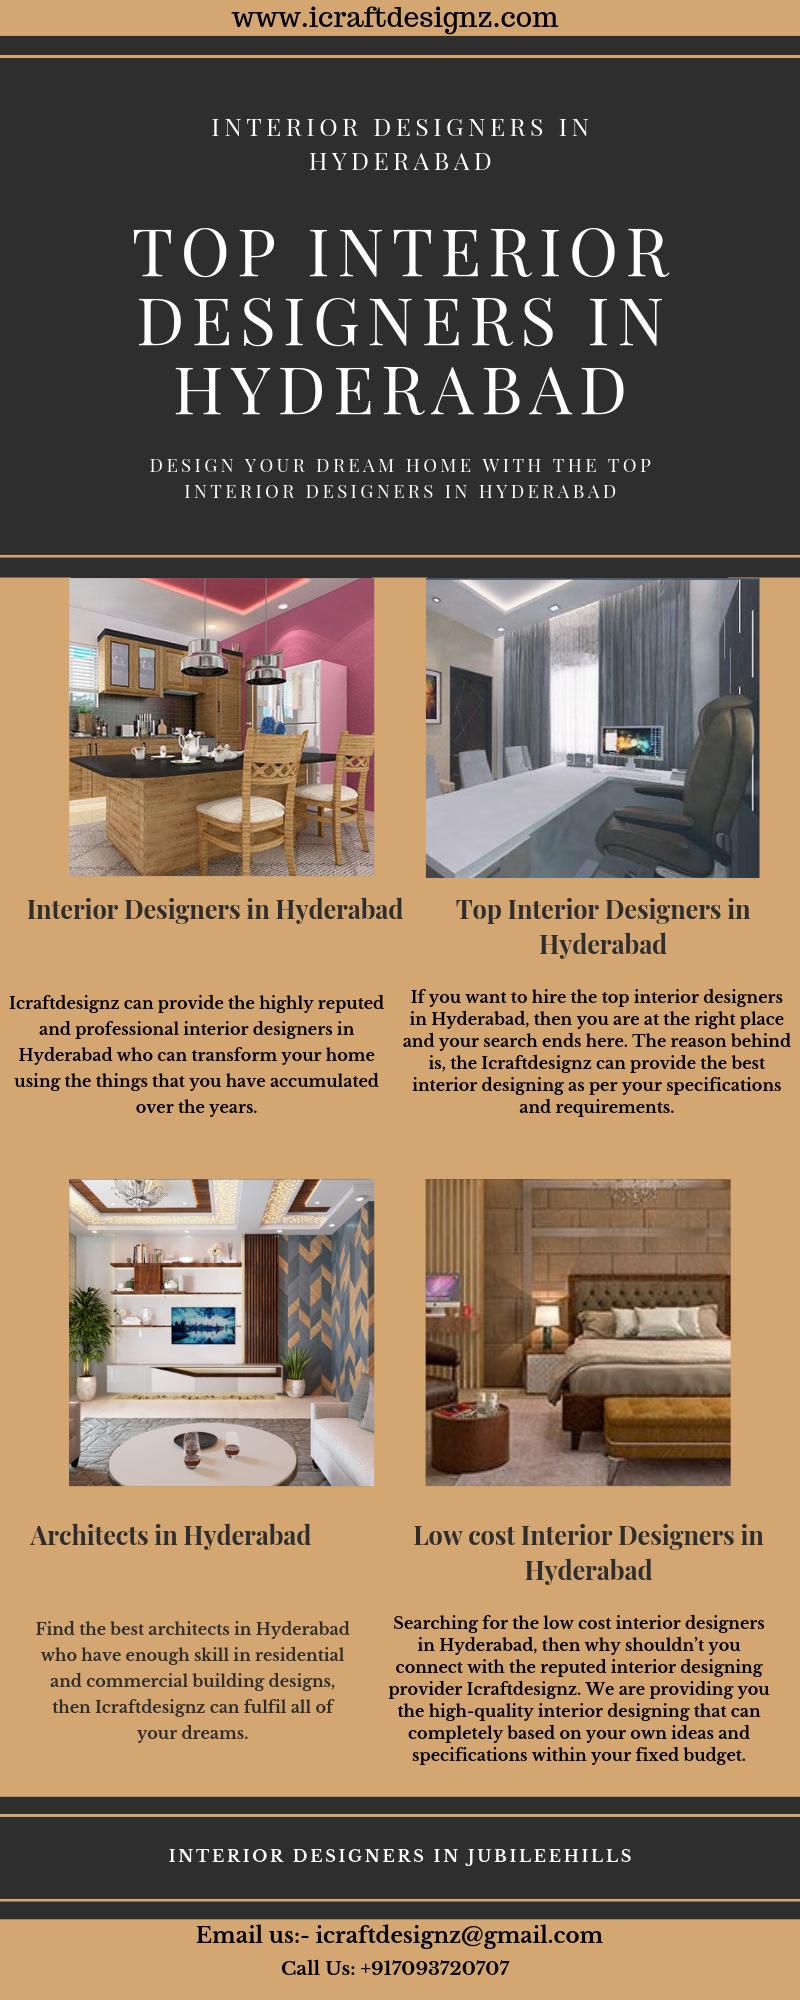 Icraftdesignz Interior Designers In Hyderabad Interior Designers In Hyderabad Corporate Interior Design Top Interior Designers